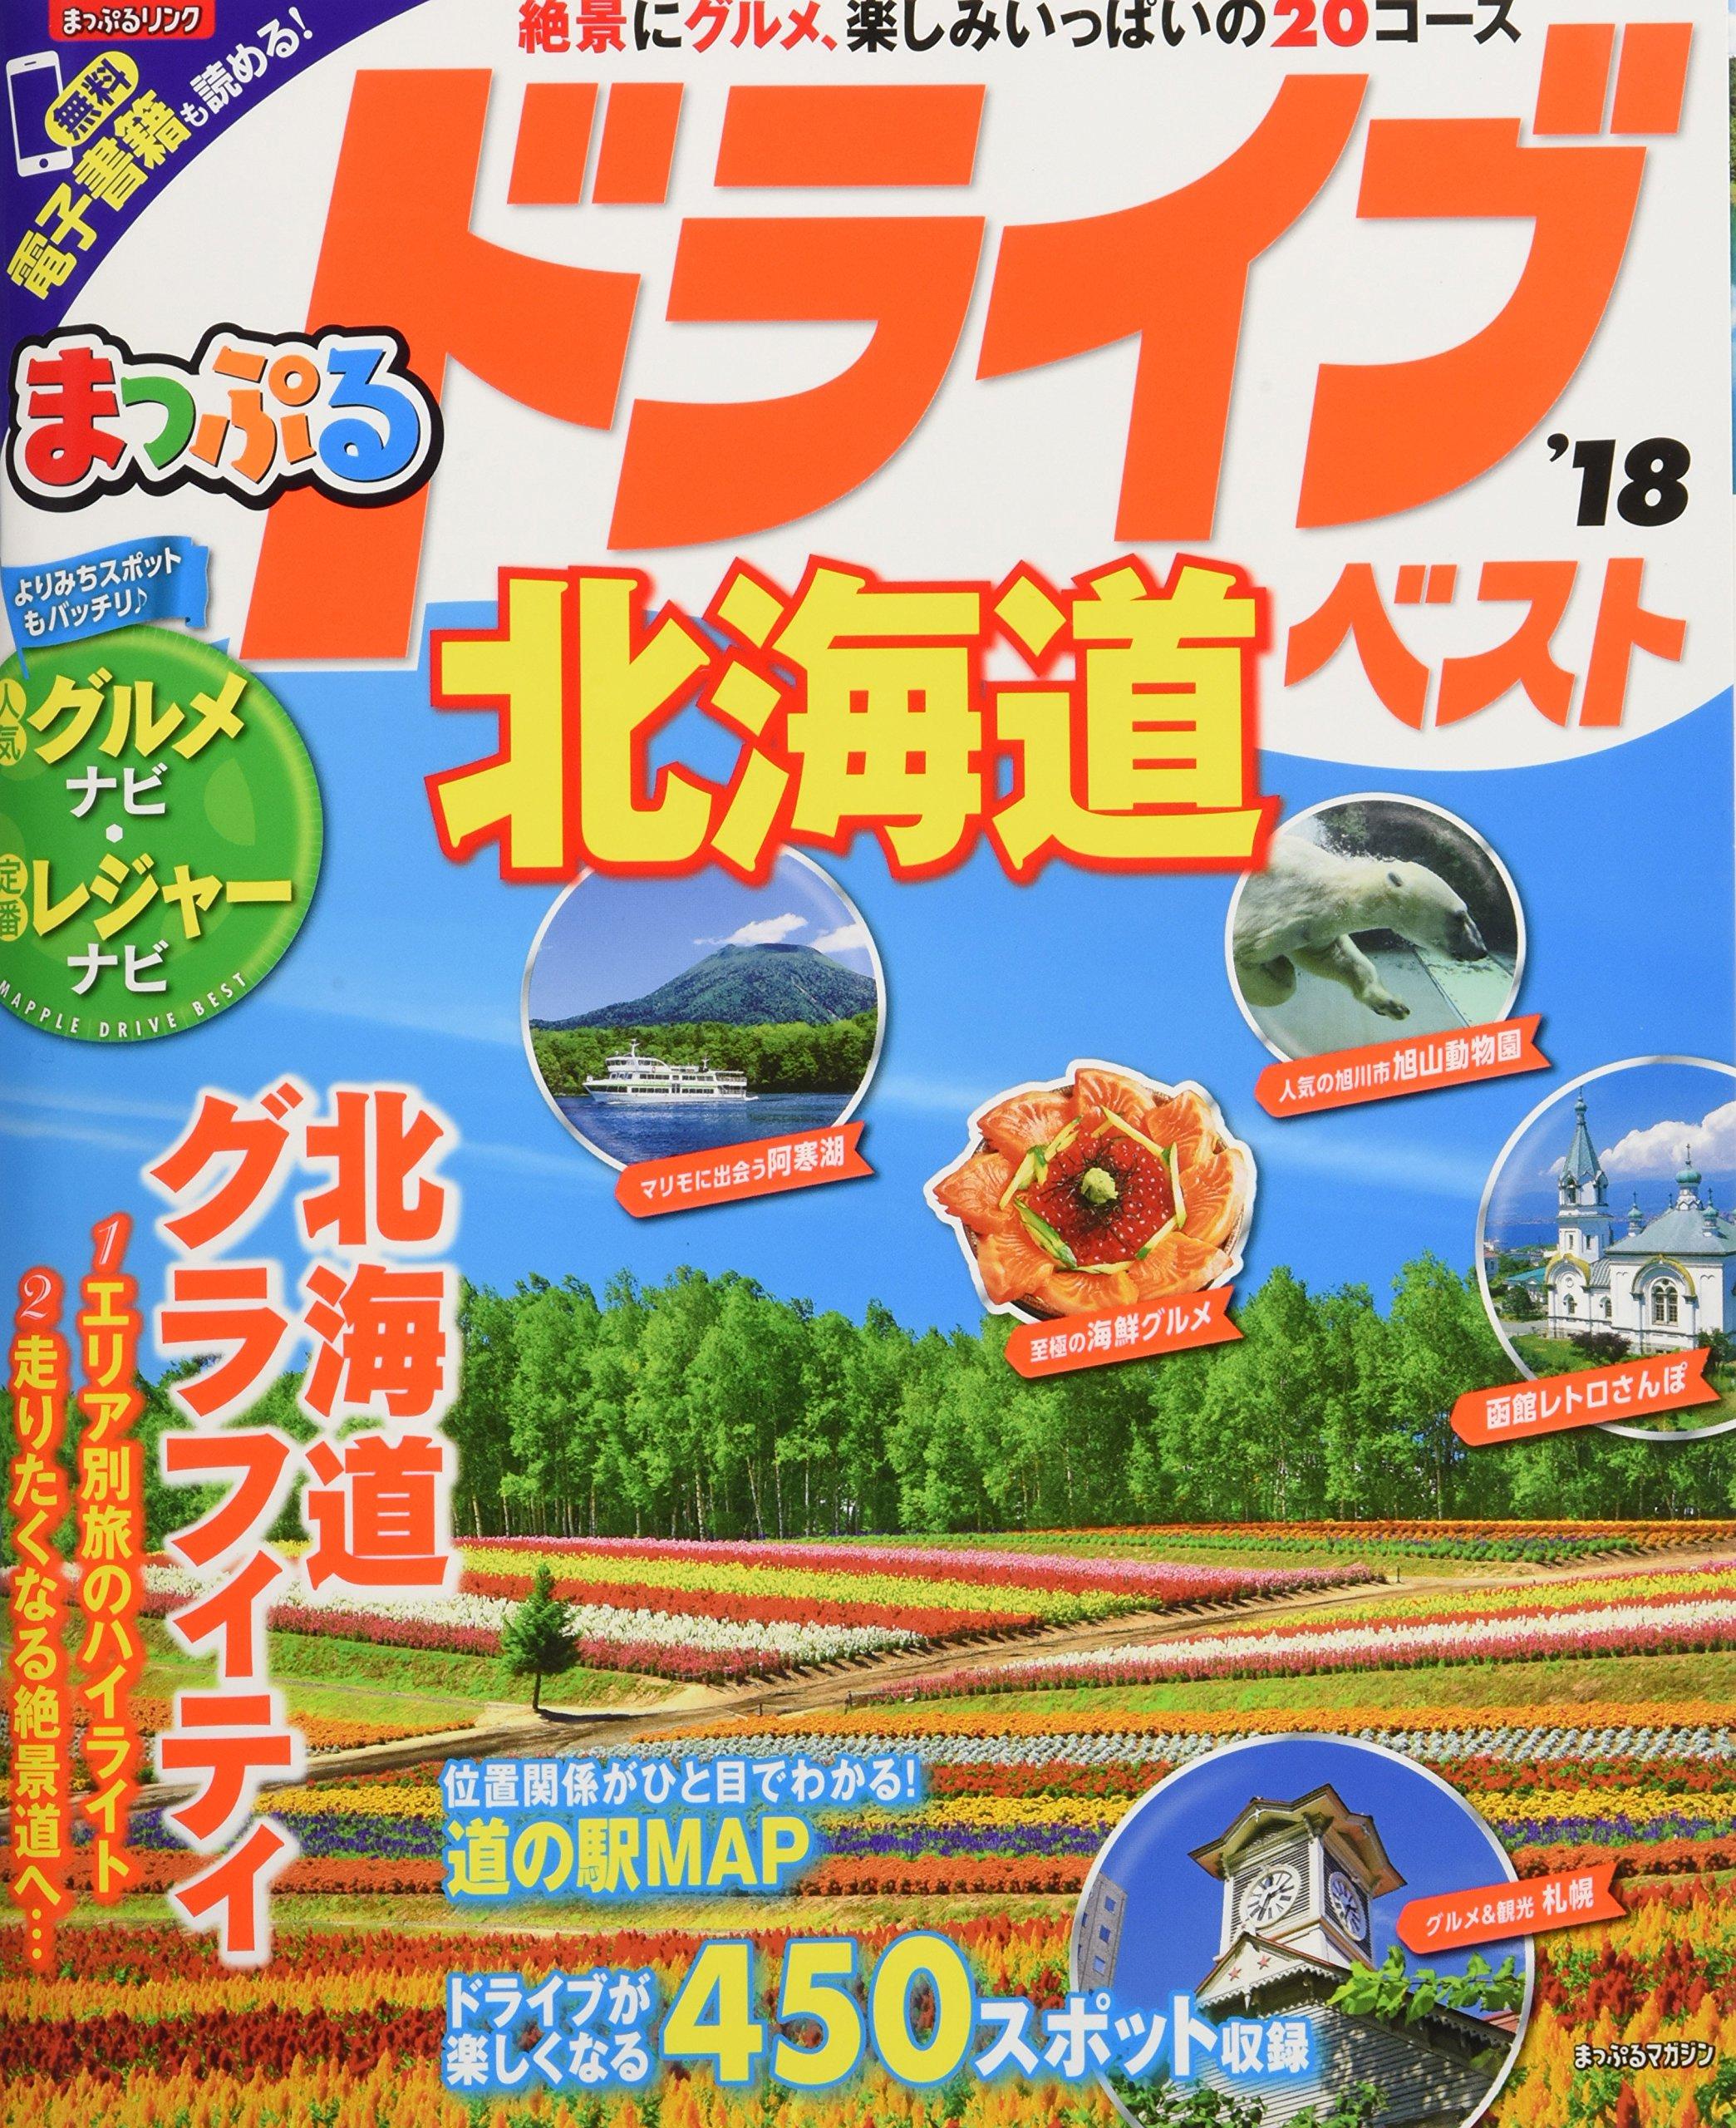 Download Tangled puru drive Hokkaido best ' 18 (chomping action magazine) pdf